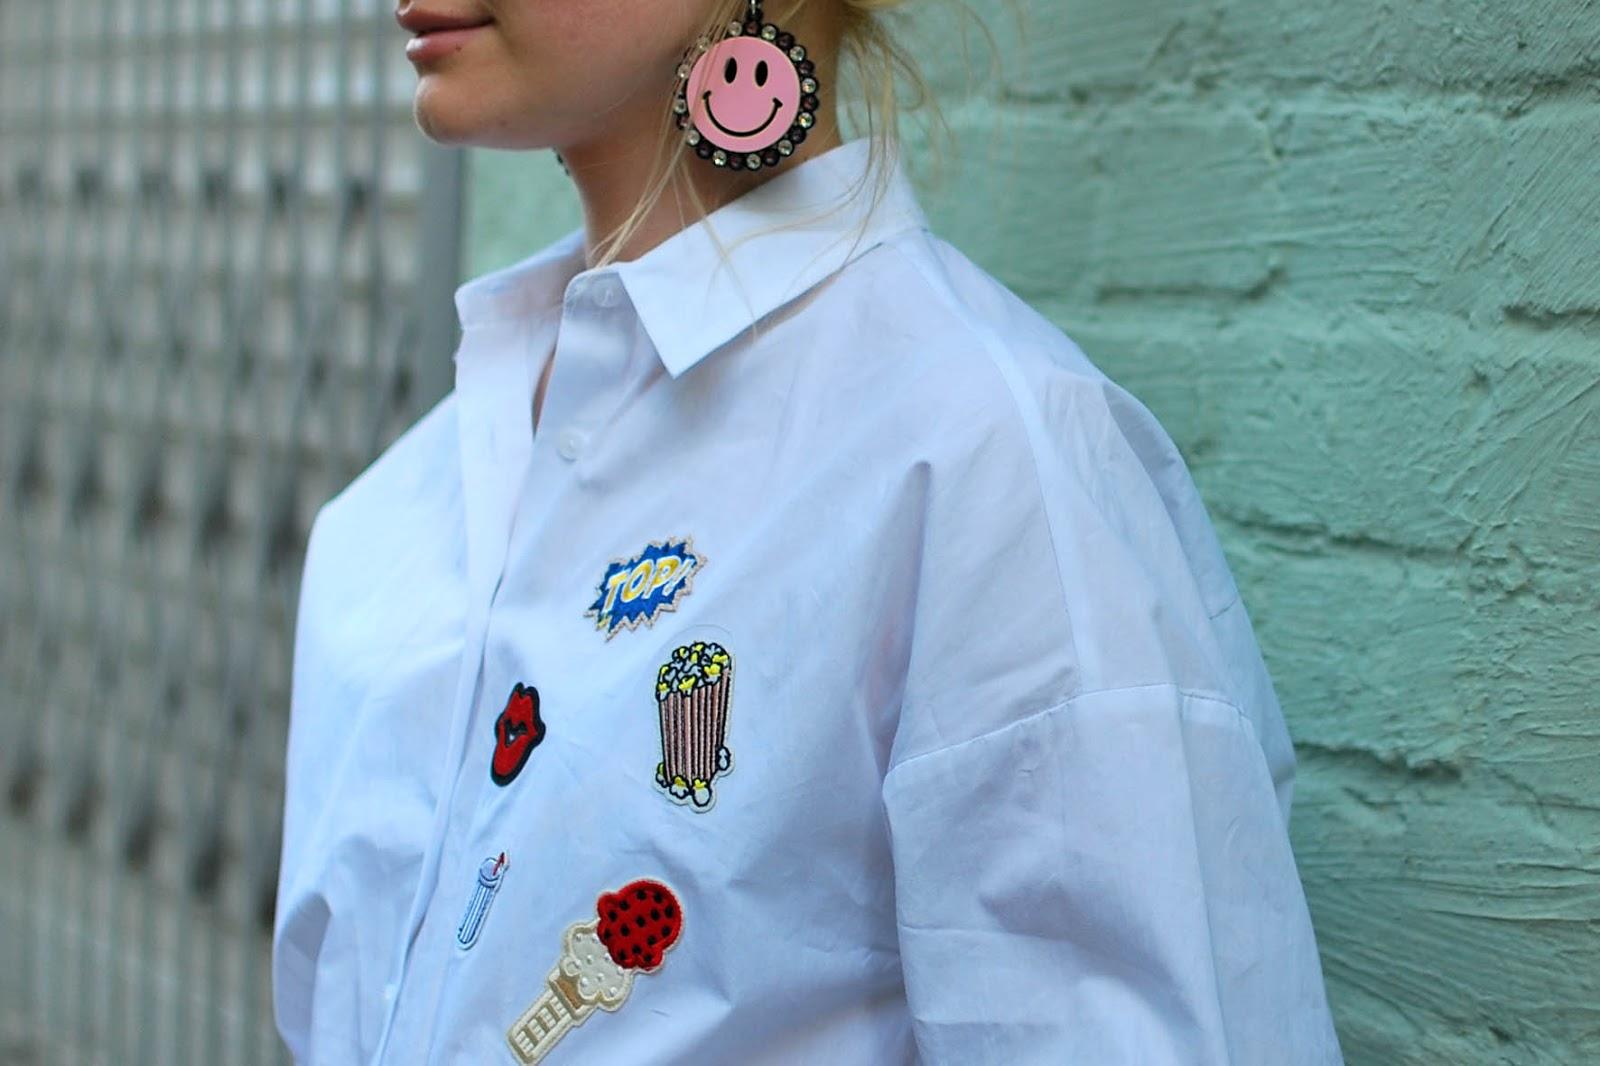 серьги из плексигласа мода, уличная мода весна лето 2016, тенденции моды 2016